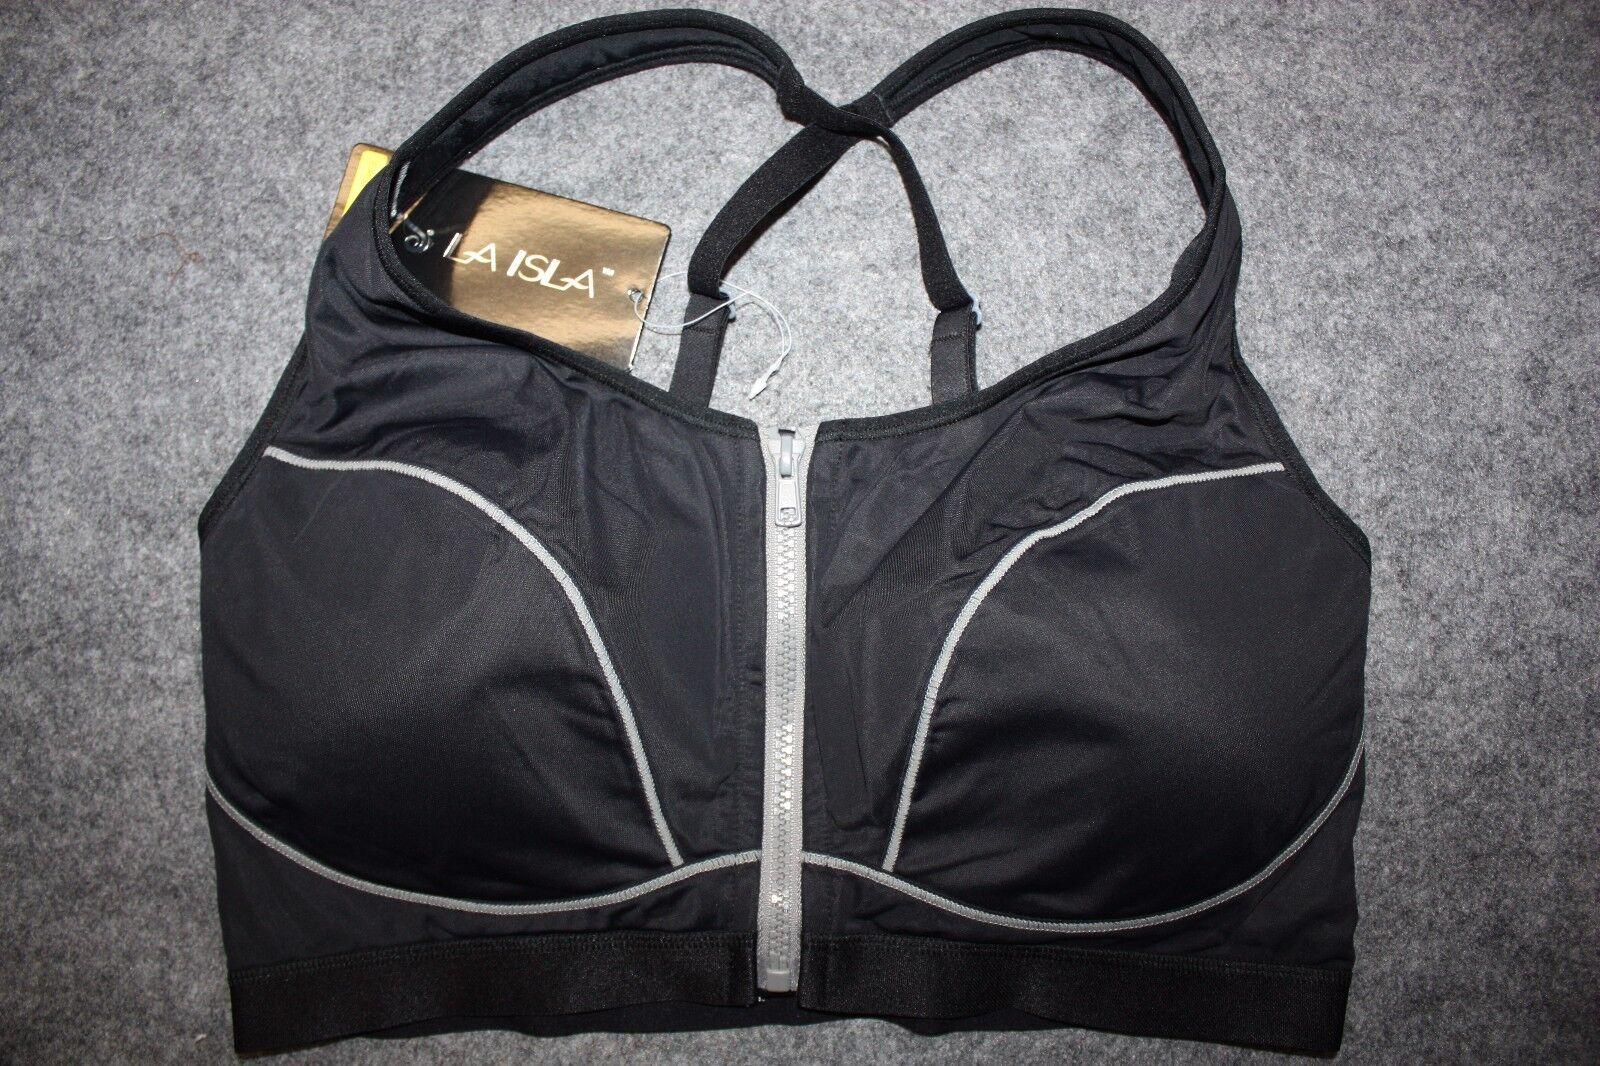 La Isla Women's High Impact Front Zipper Sports Bra E Style A188